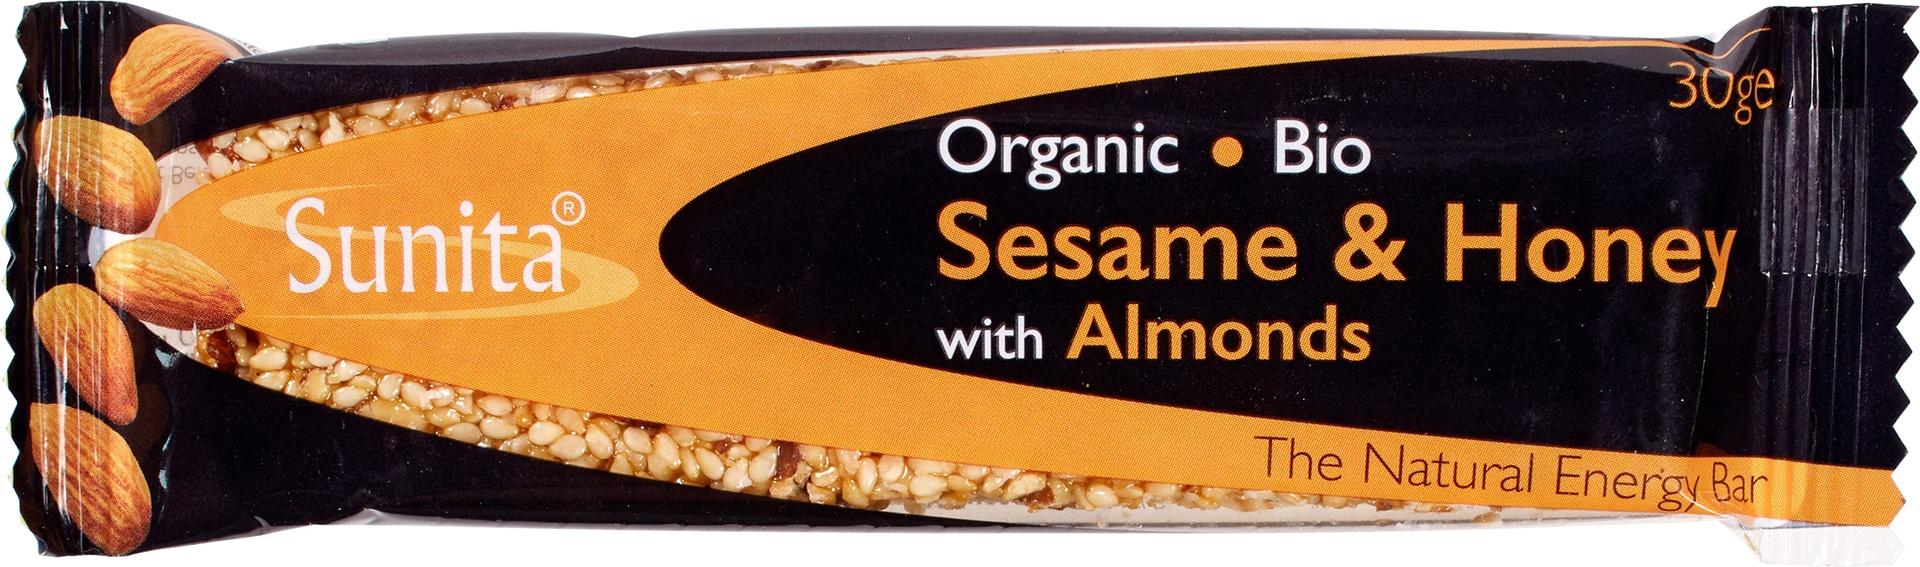 Biologische Sunita Sesambar honing amandel 30 gr